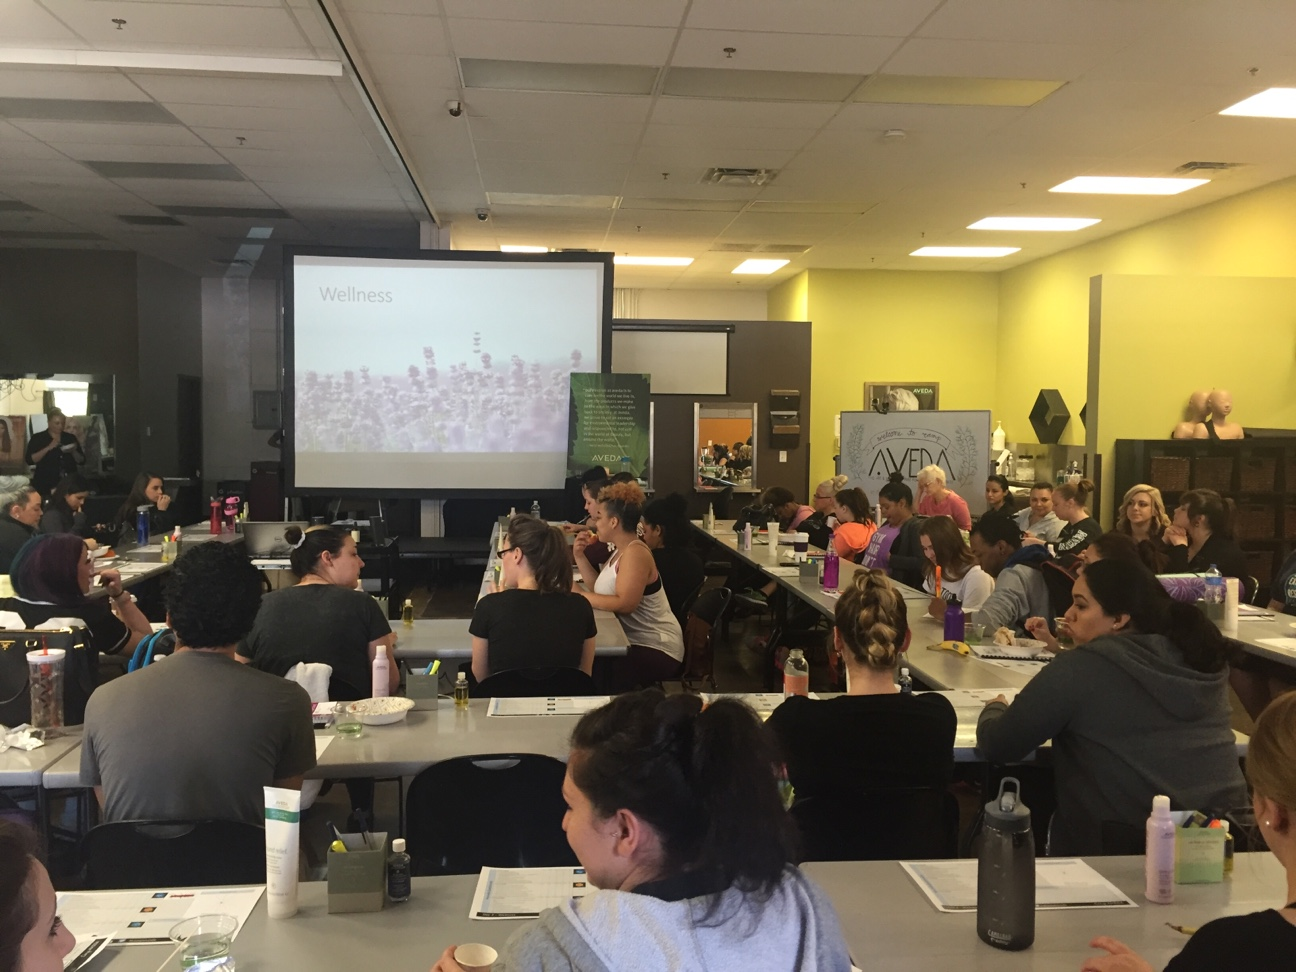 Orlando beauty School classes begin